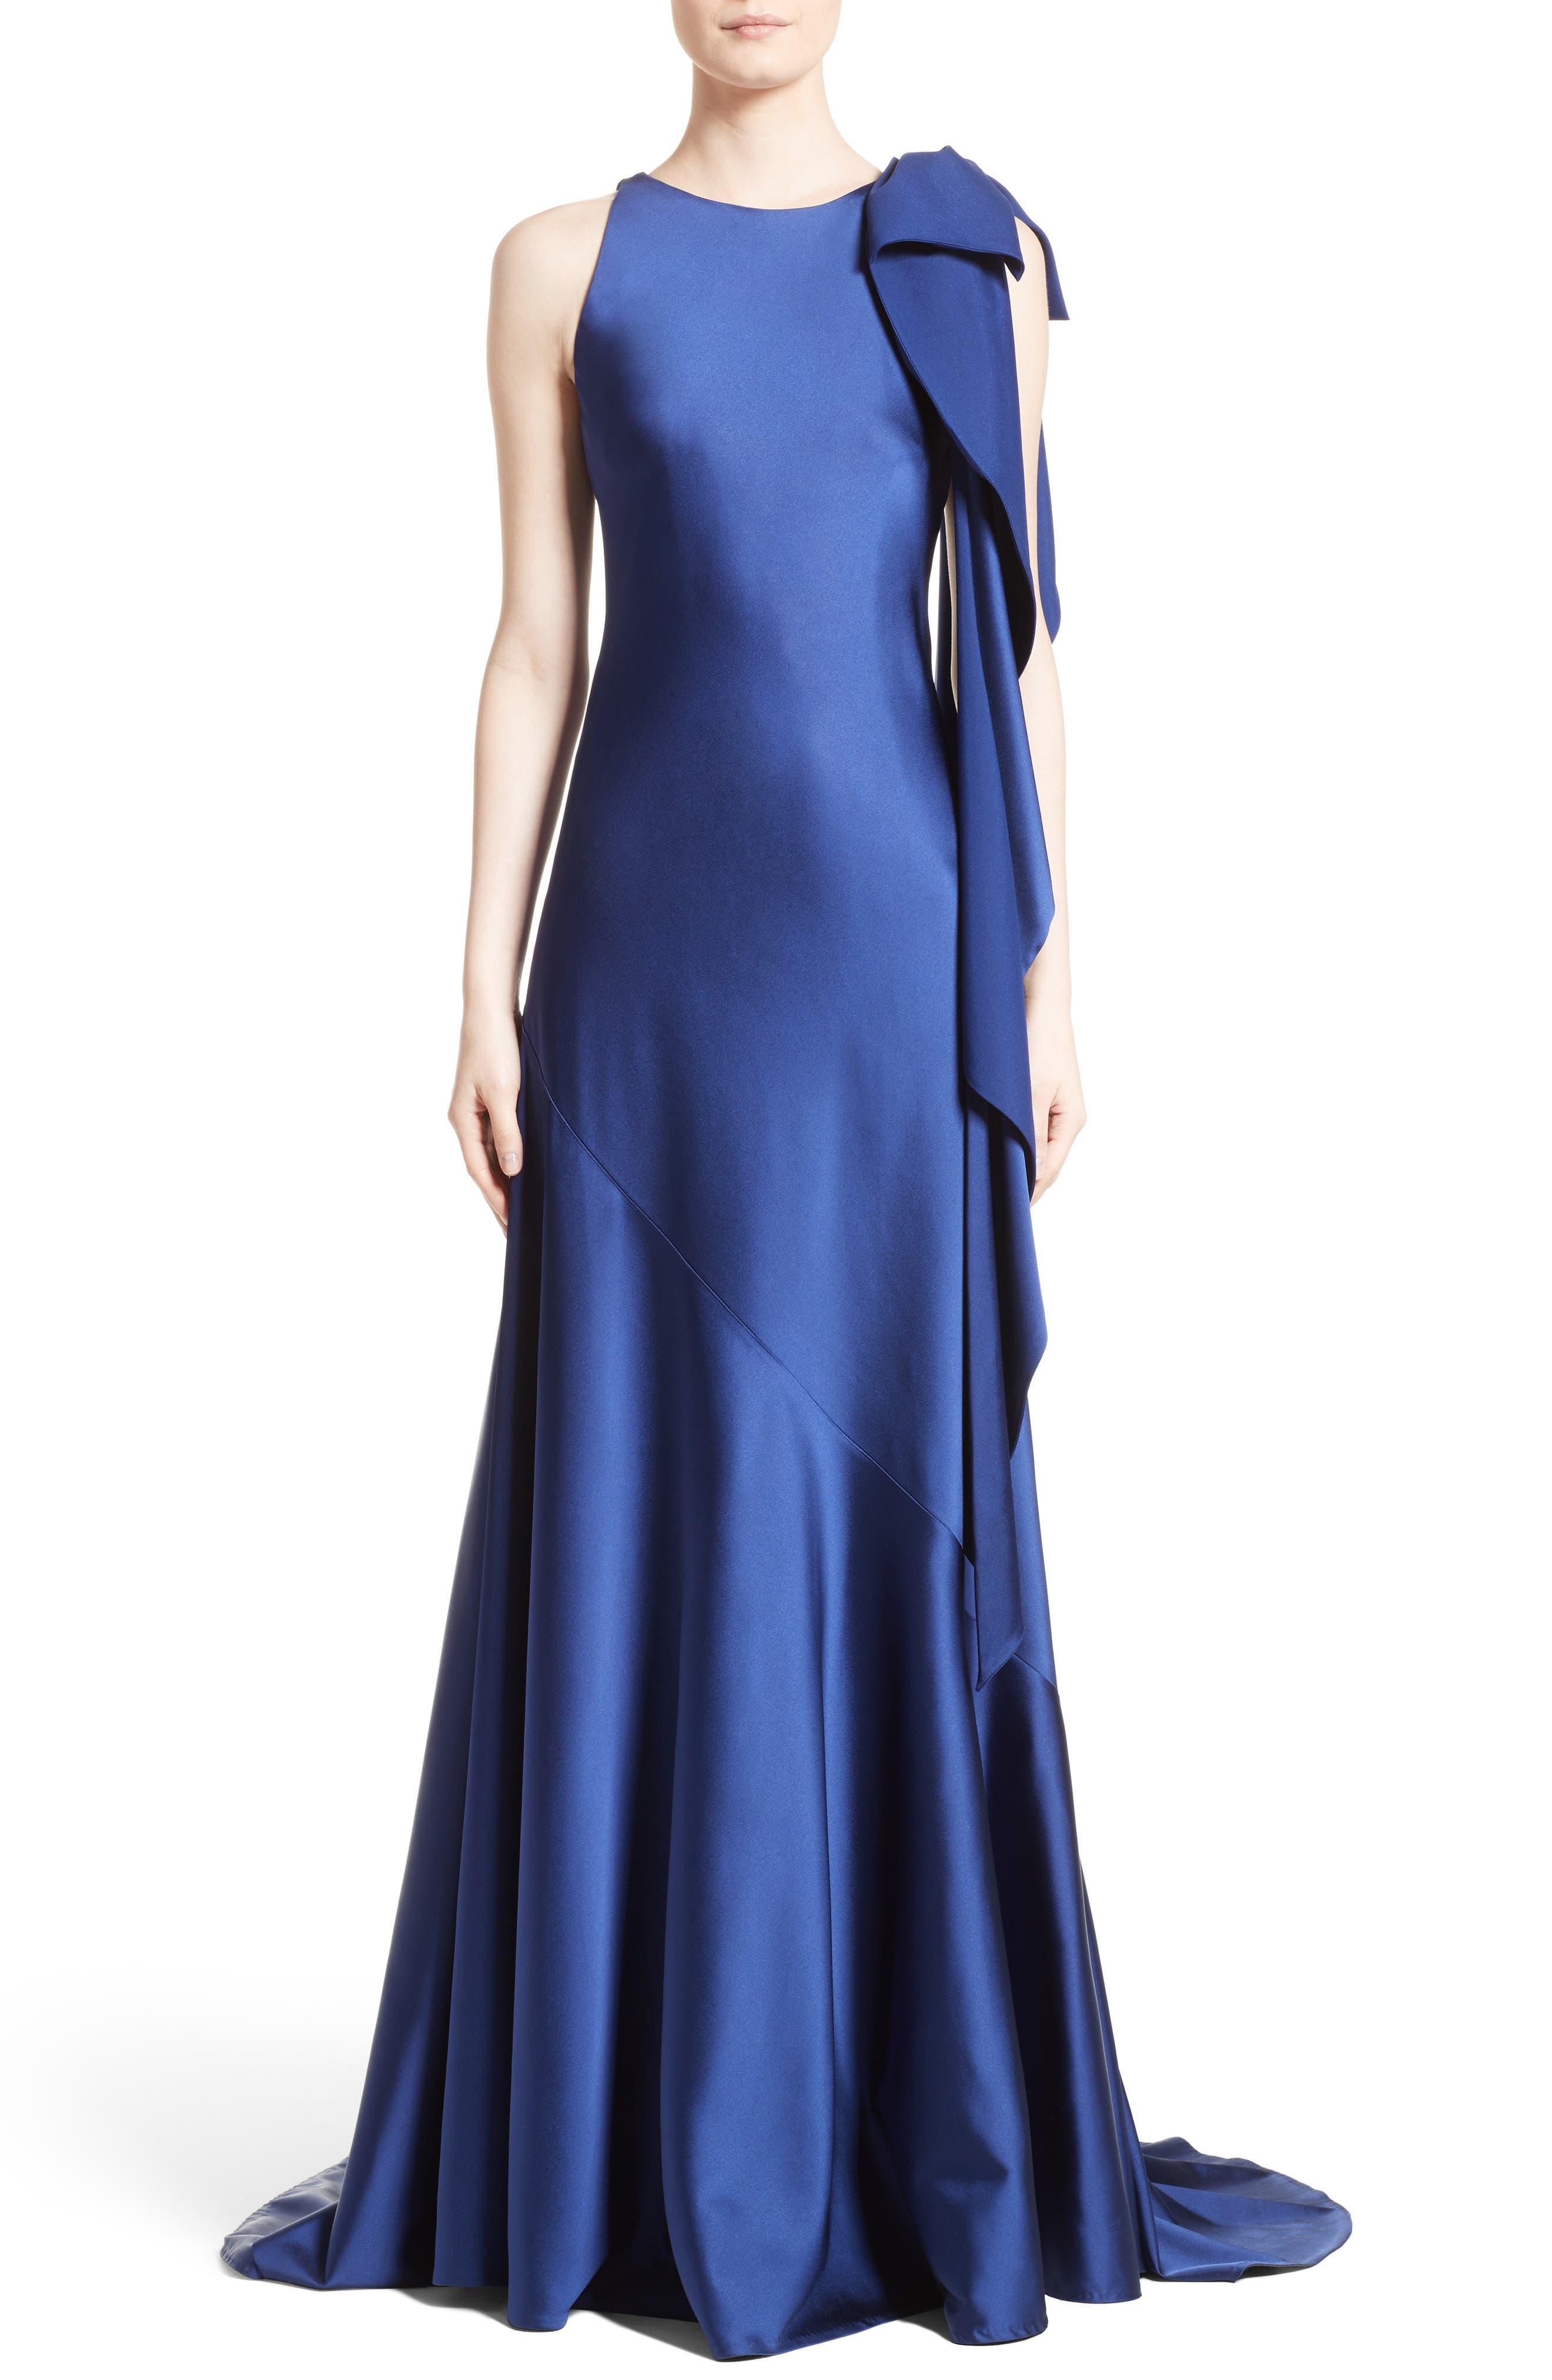 Main Image - Talbot Runhof Bow Detail Crepe Satin Gown